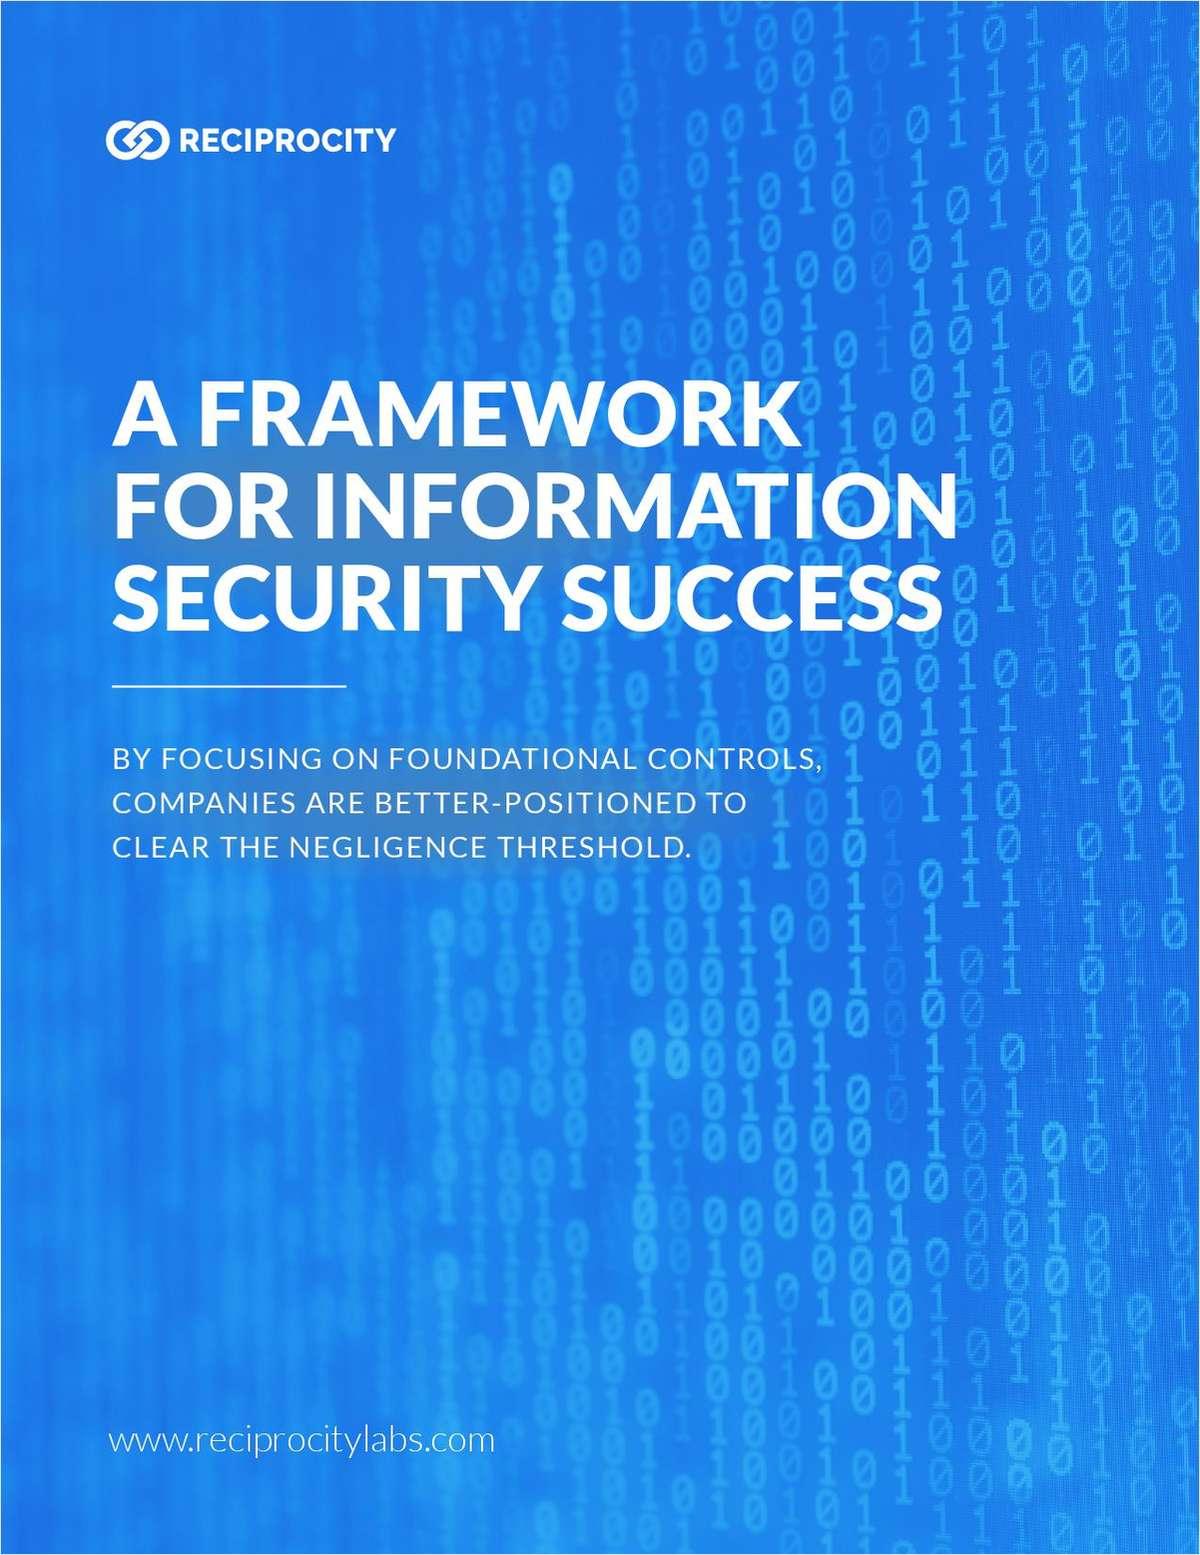 A Framework for Information Security Success